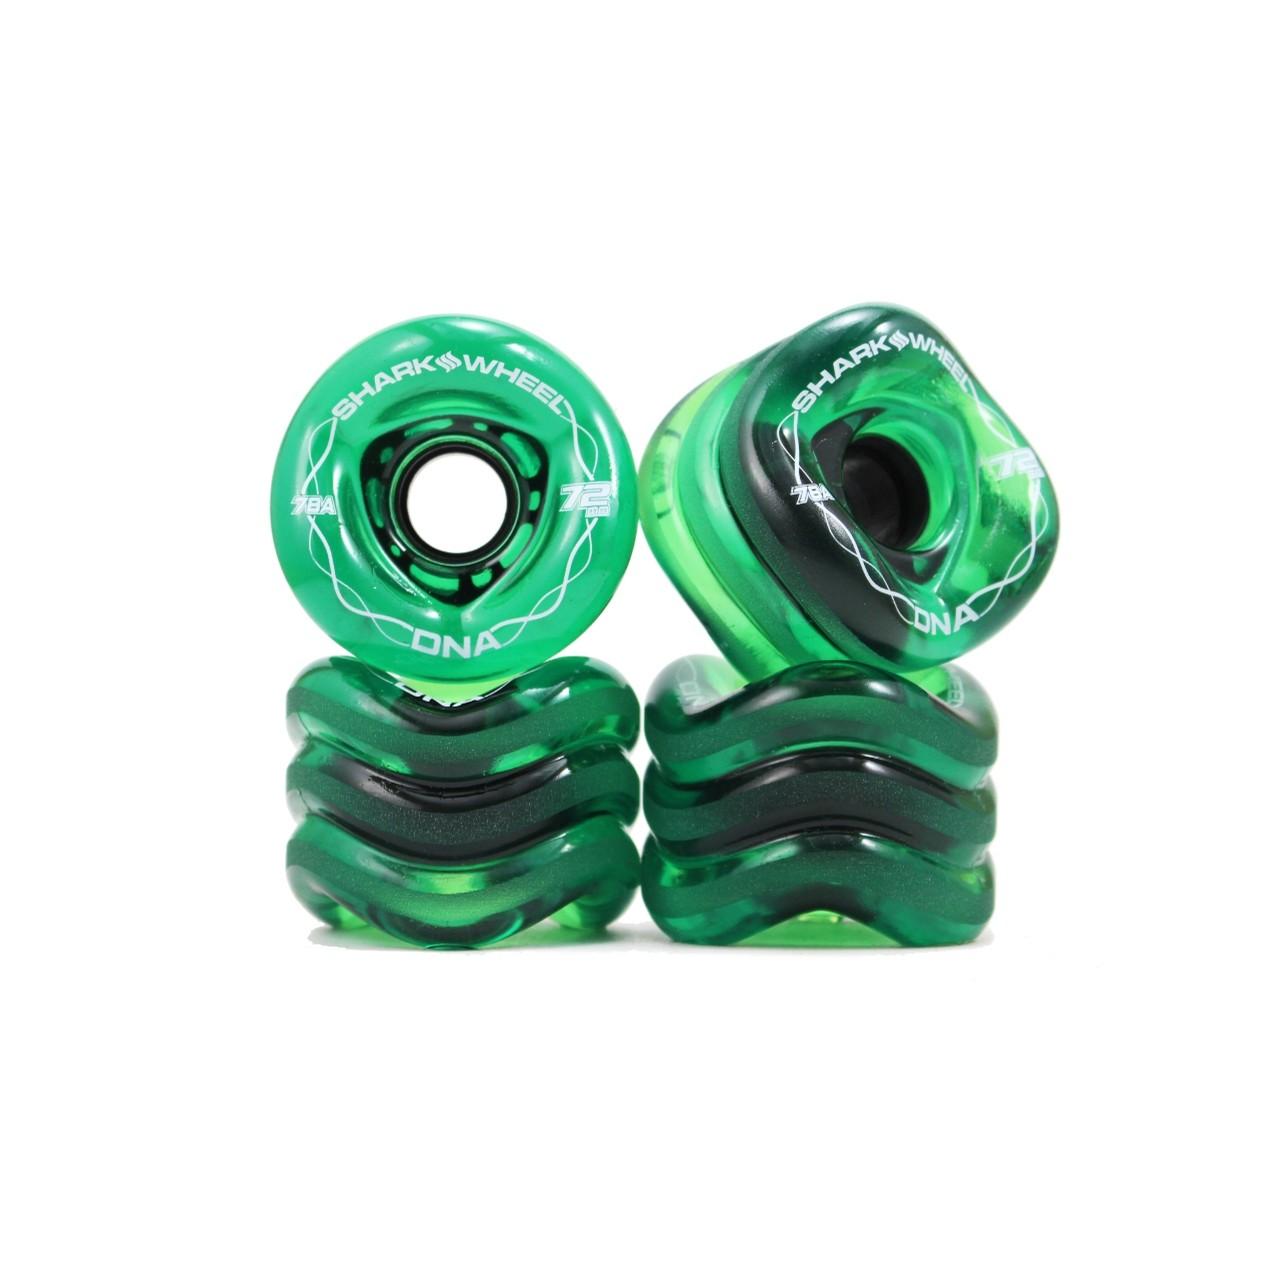 DNA 78A (Transparent Green)